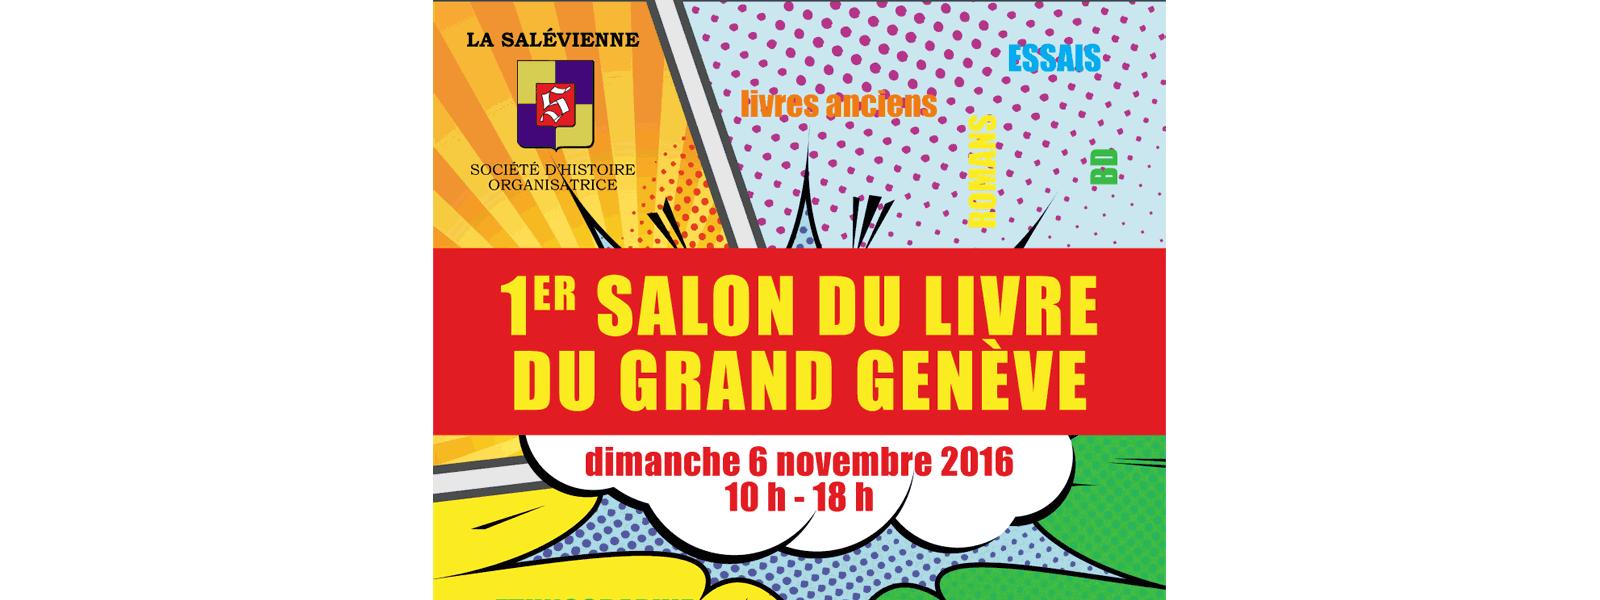 Salon du livre du Grand Genève 2016